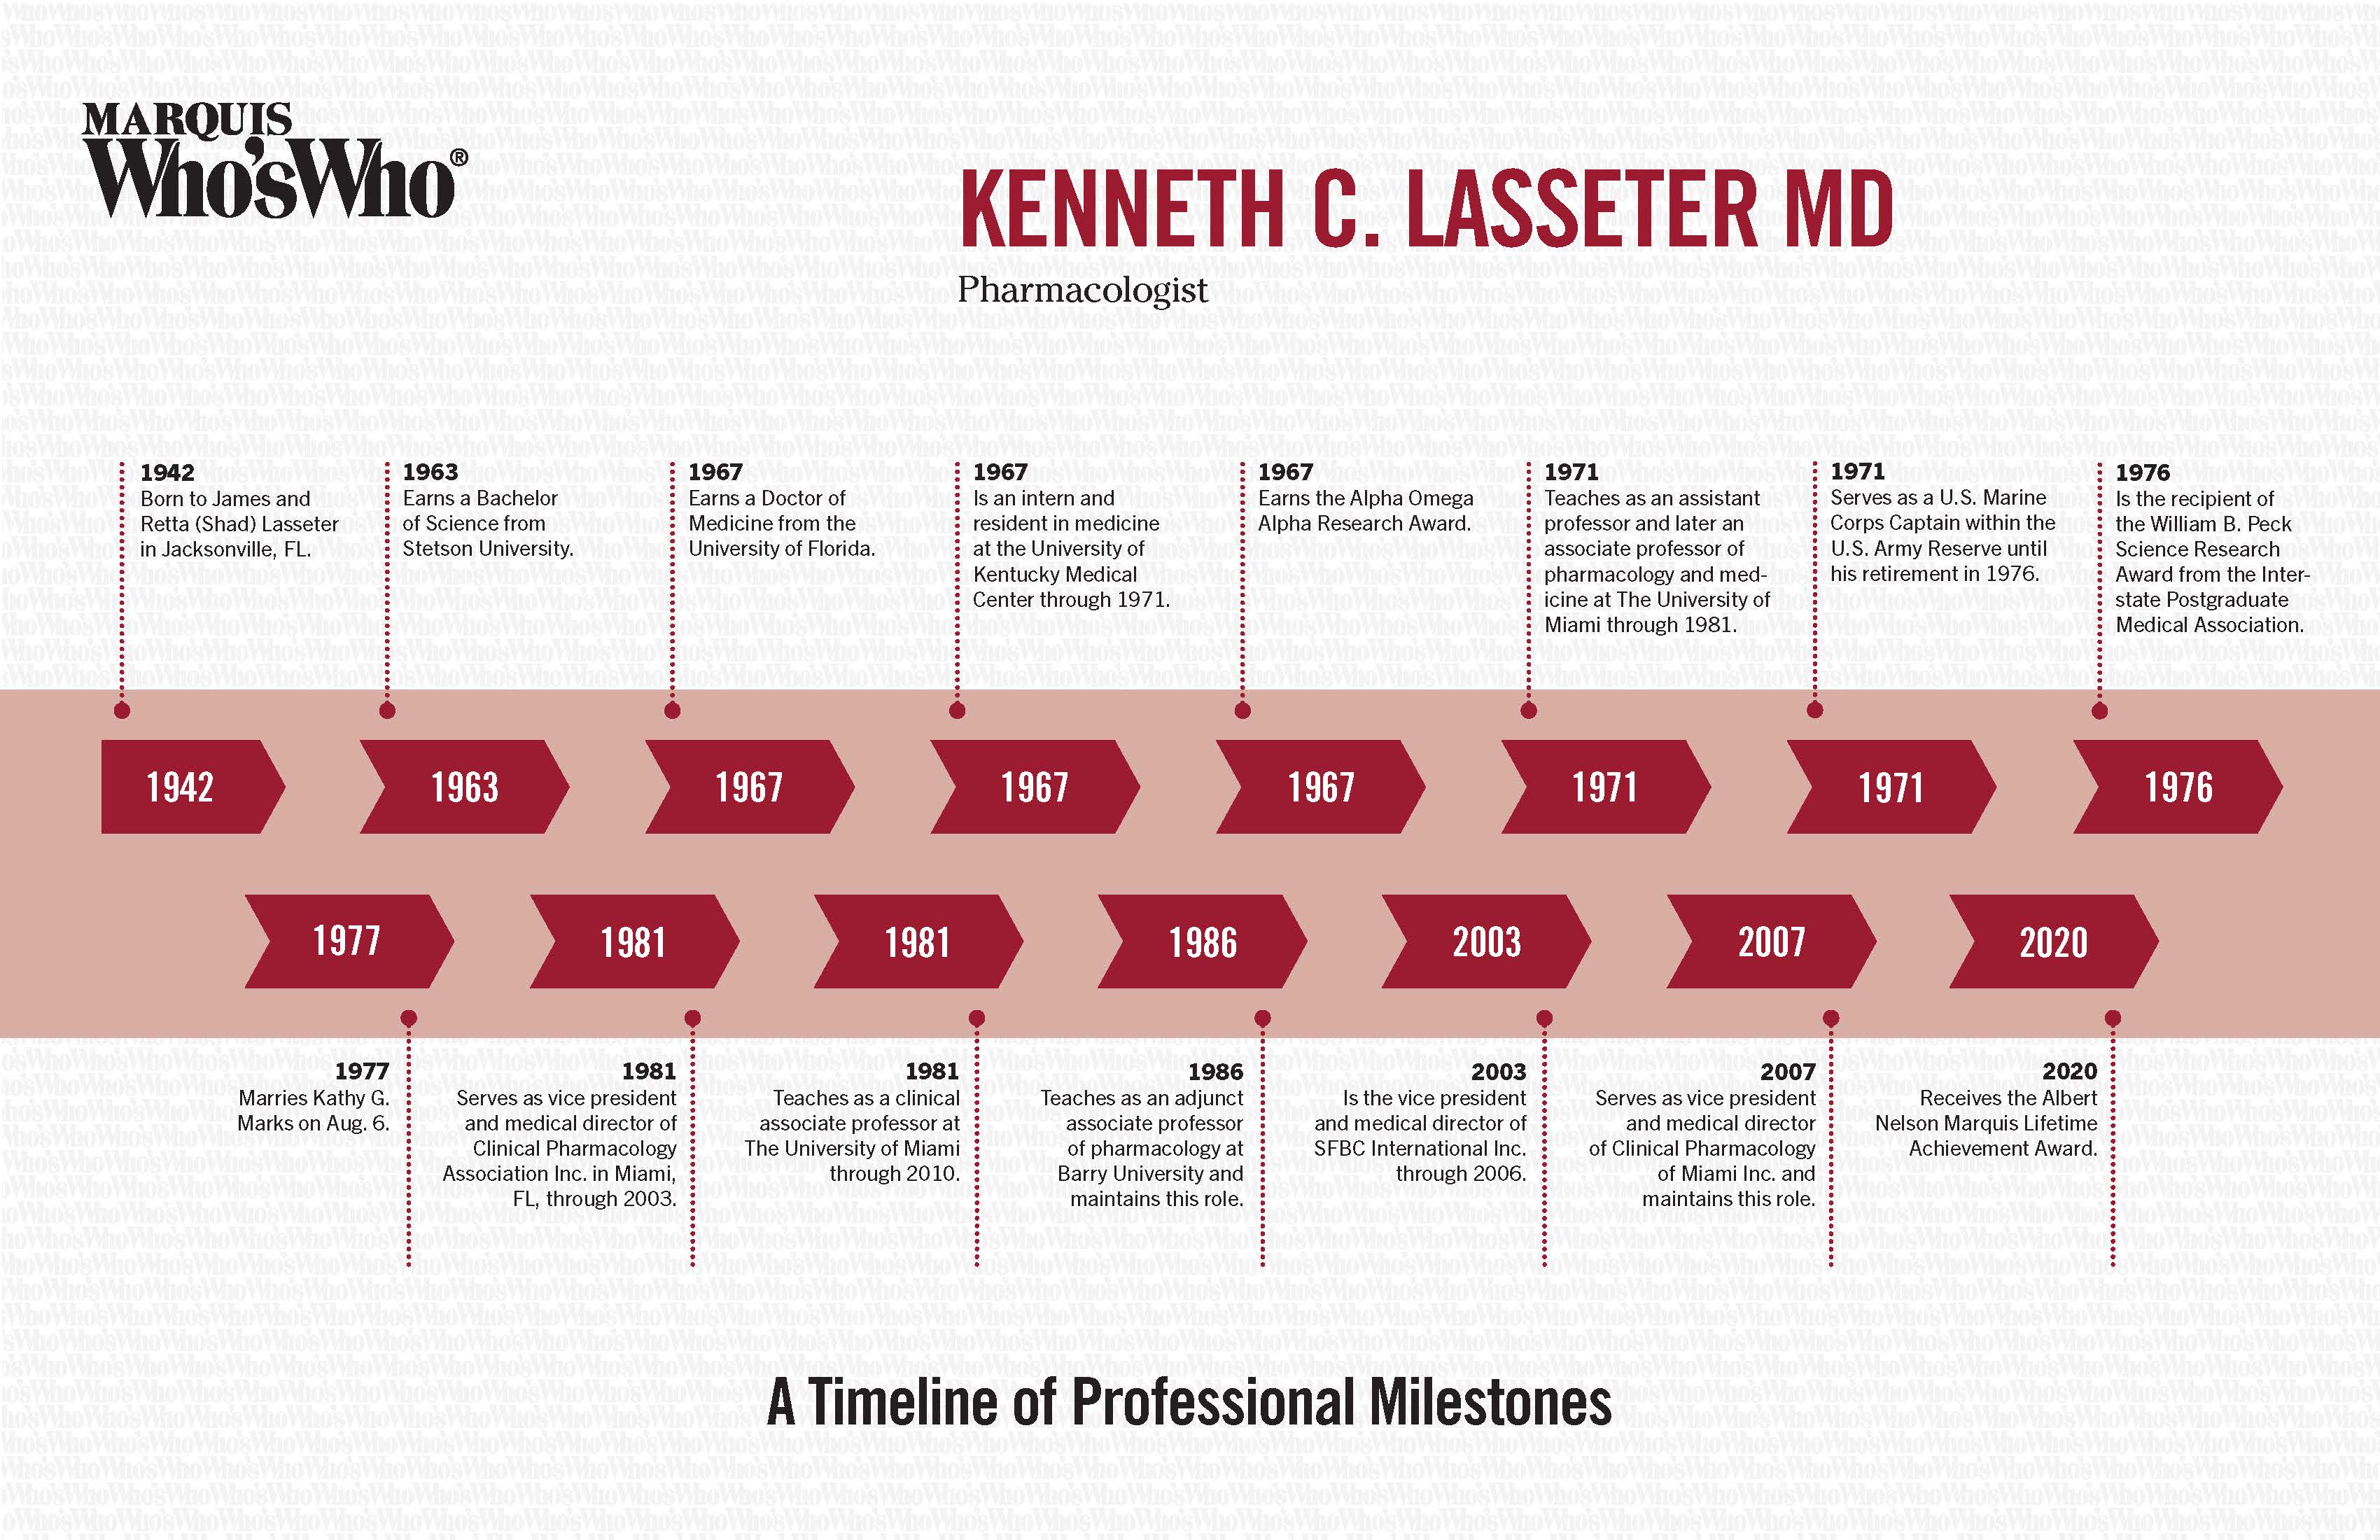 Kenneth Lasseter